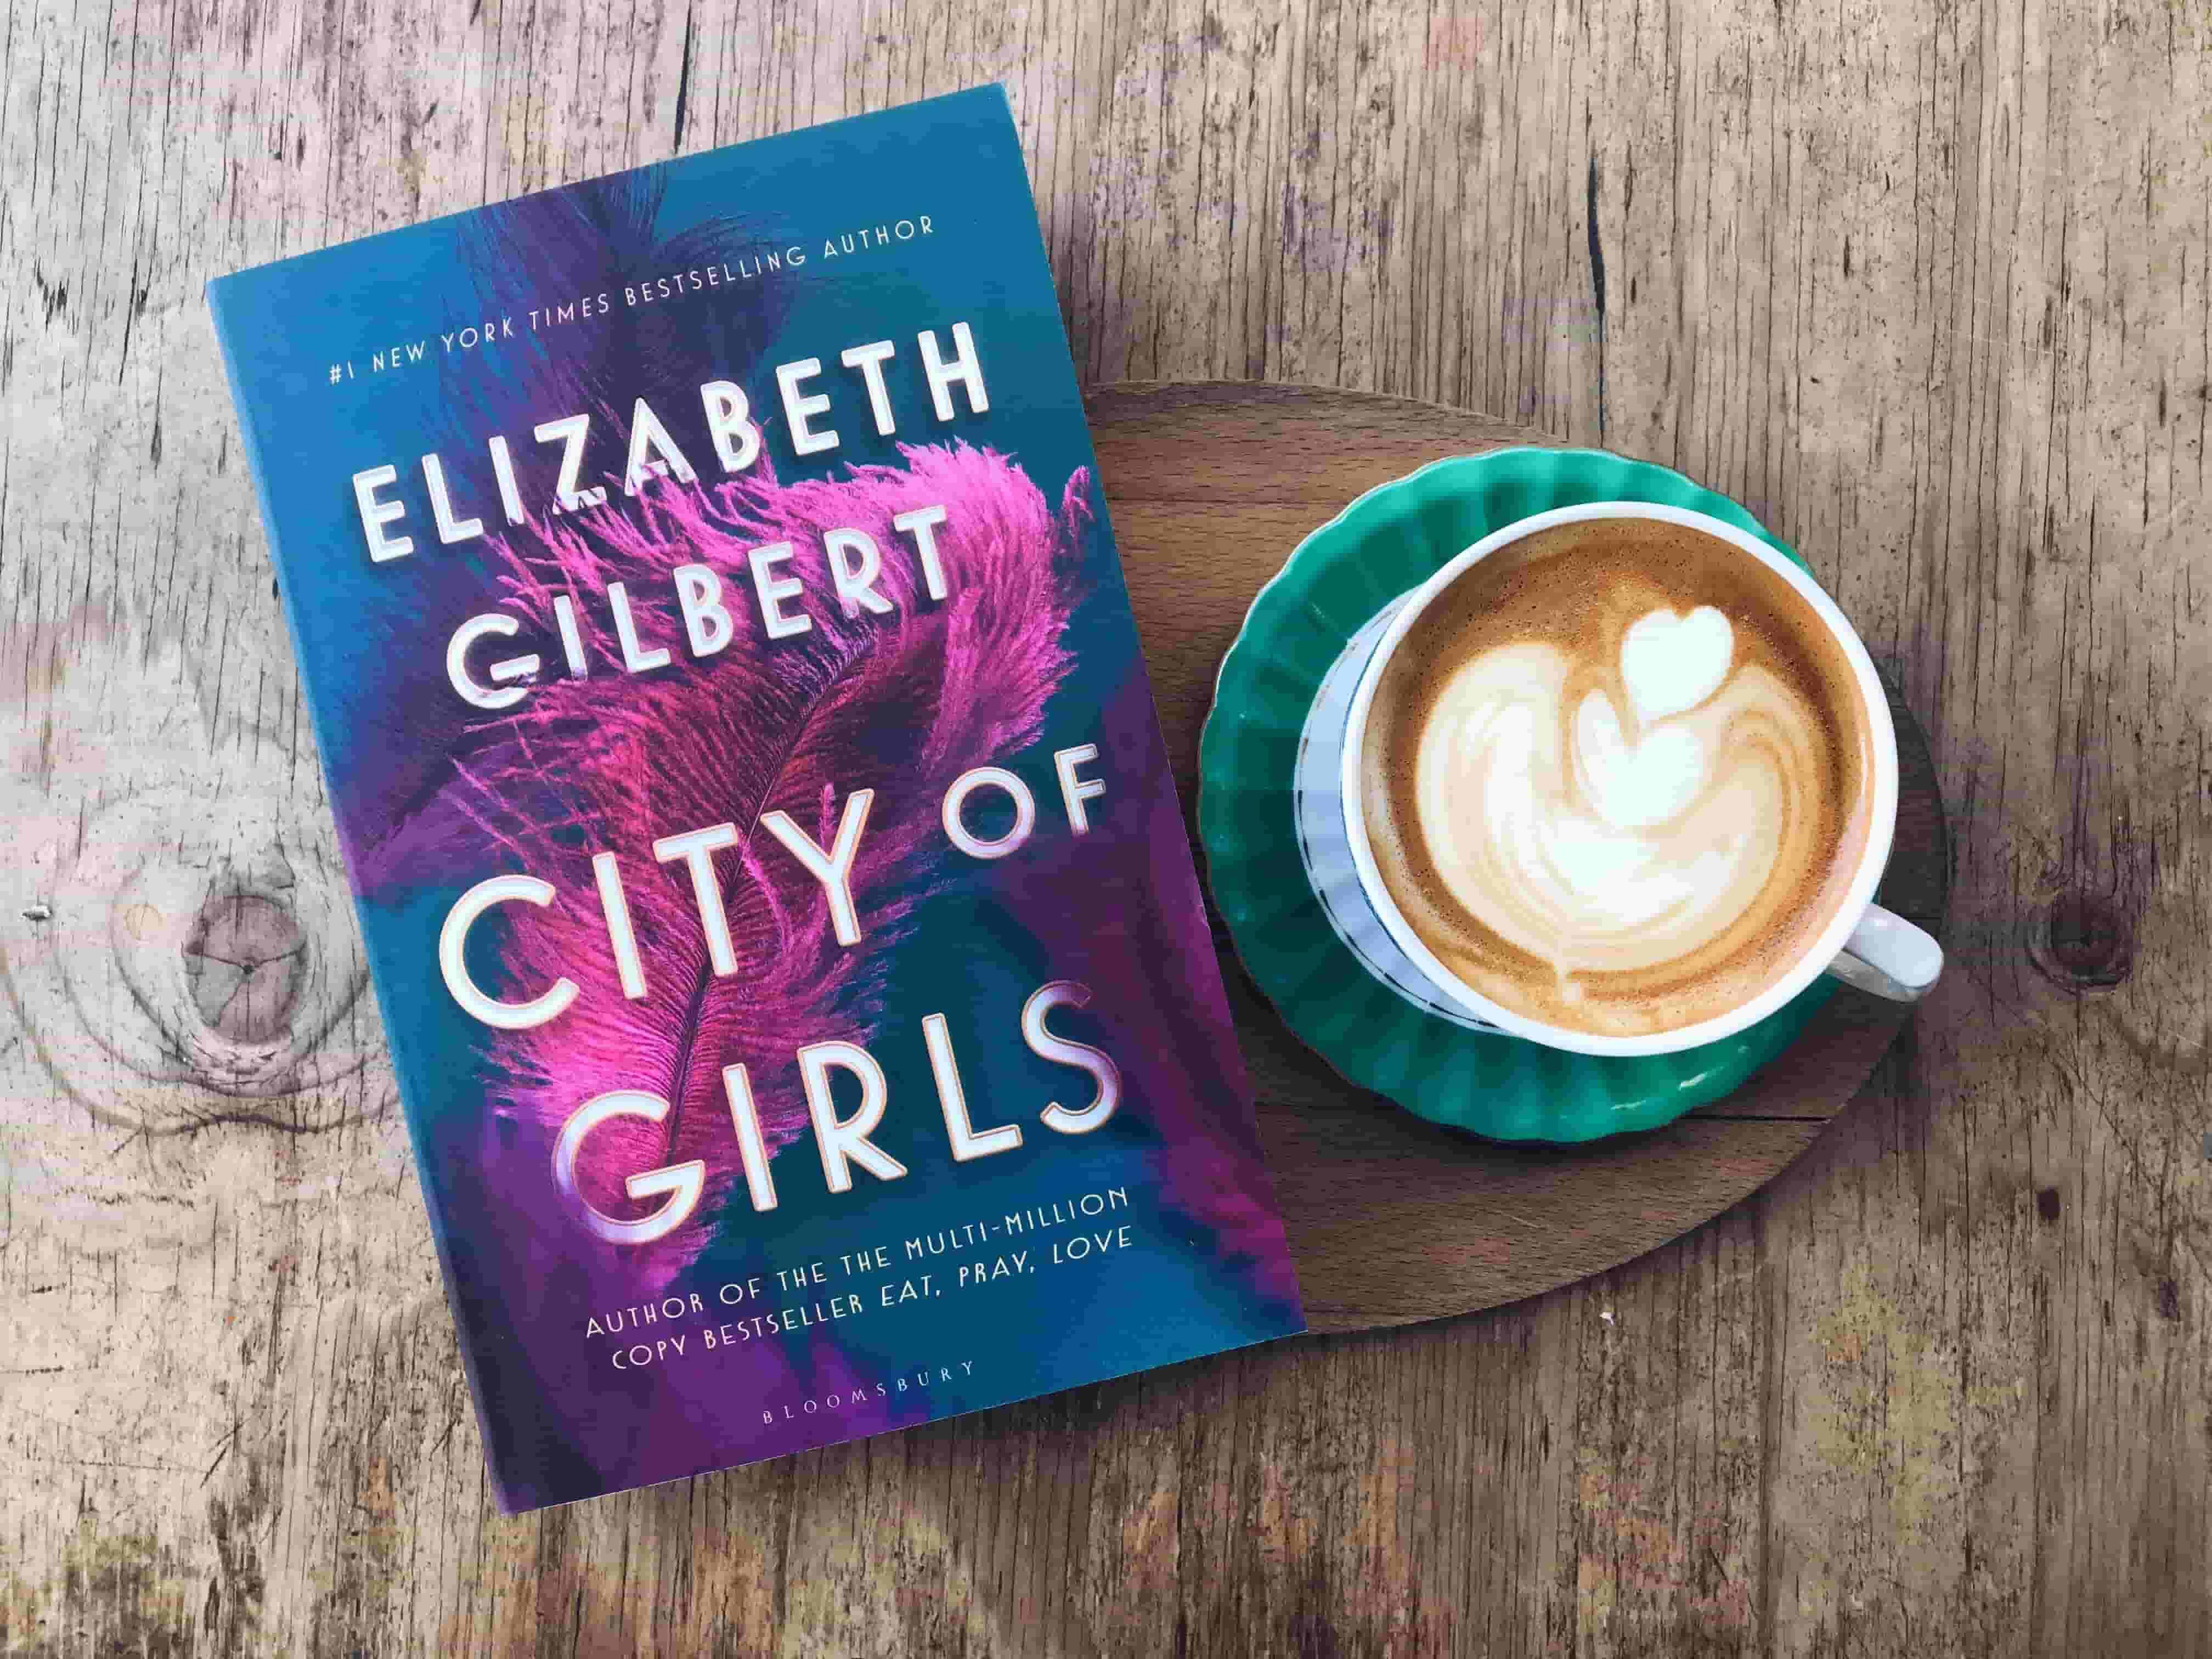 Cit of Girls by Elizabeth Gilbert